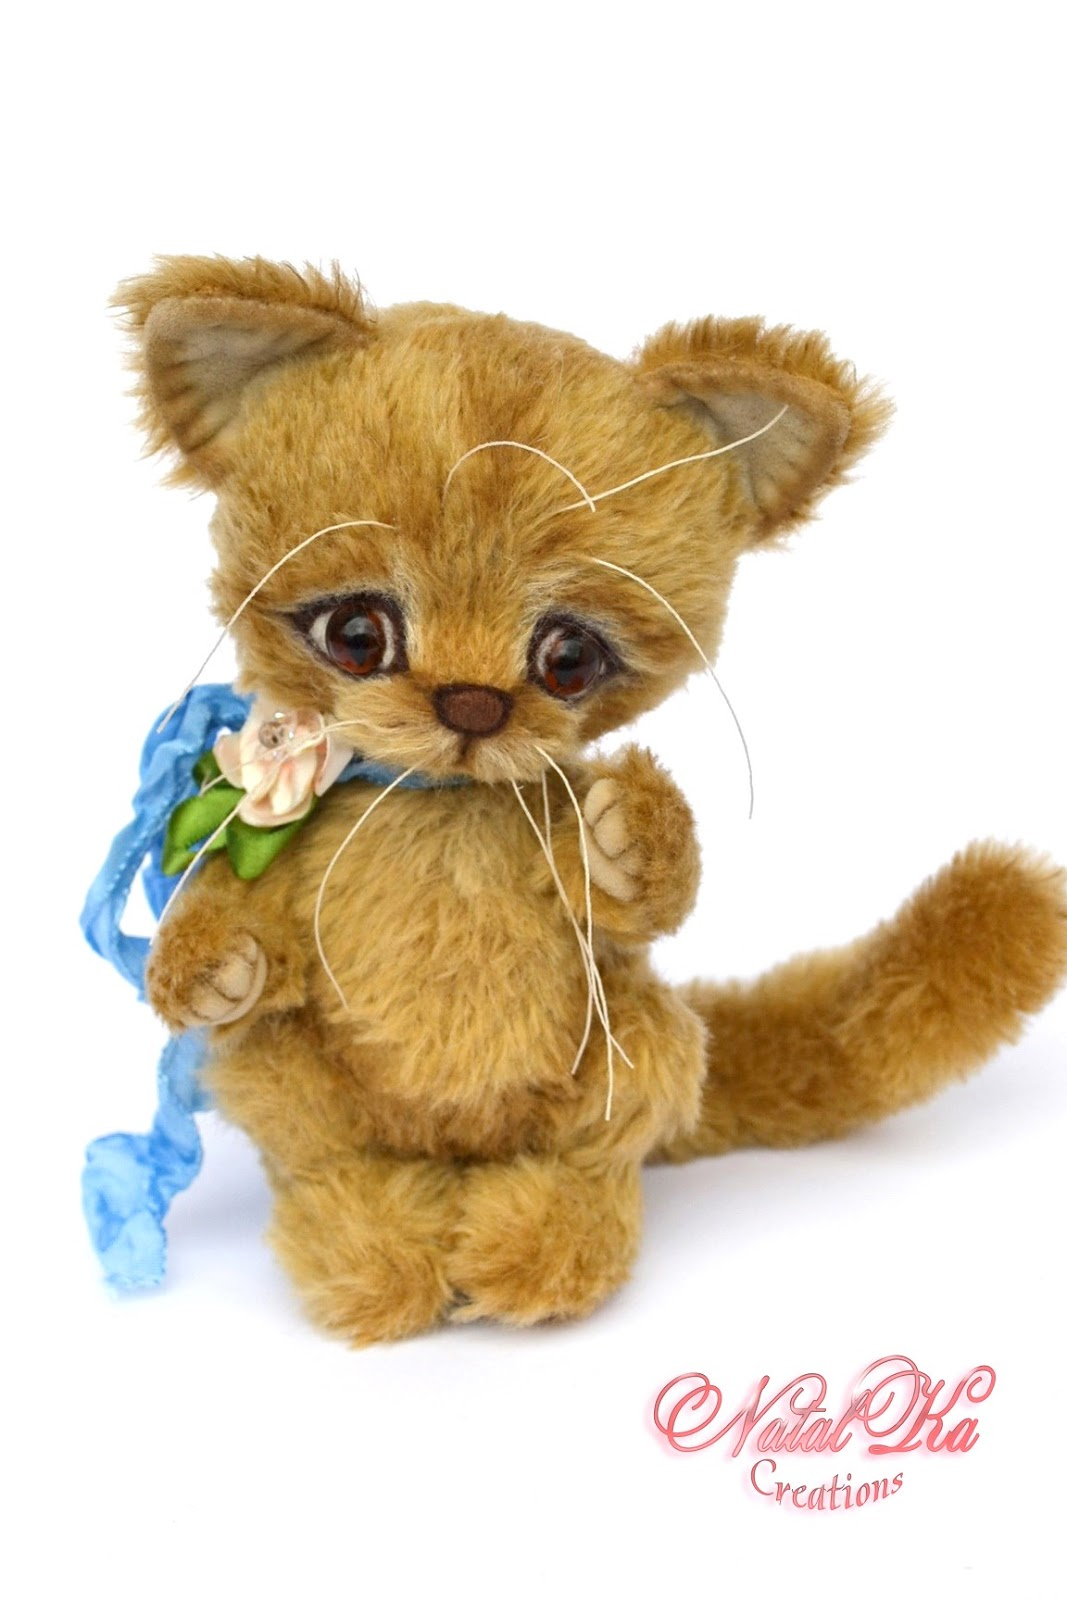 Авторский котенок тедди, кот тедди, кошка, artist teddy cat, artist kitten, teddy kitten jounted, ooak, Künstlerkatze, Teddy Kater, Unikat, handmade teddies by NatalKa Creations